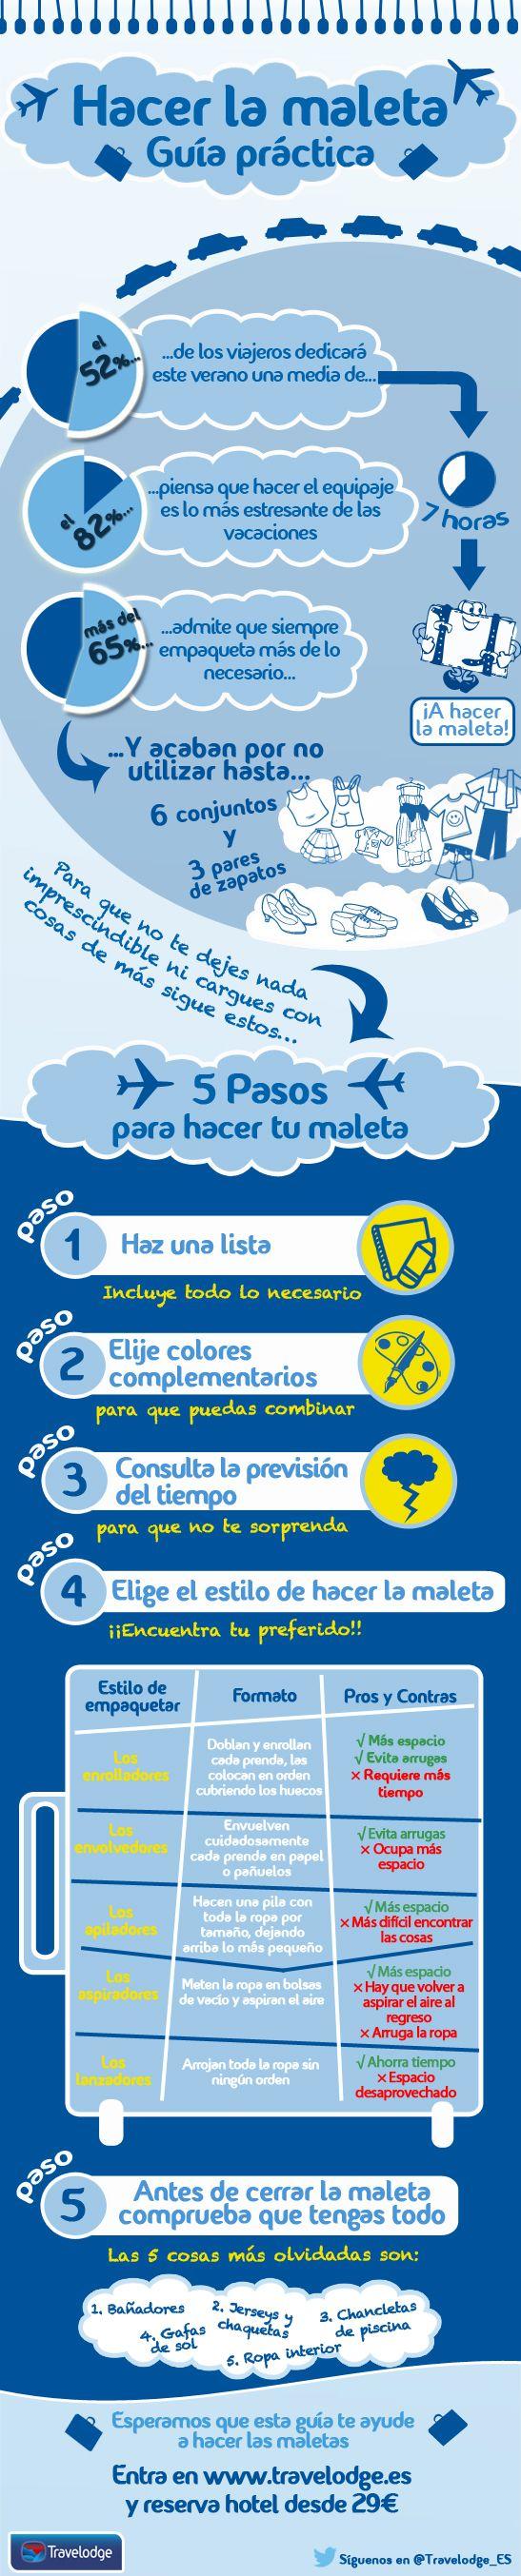 Guía Práctica para Hacer las Maleta || Consejos para empaquetar | Blog de Travelodge España